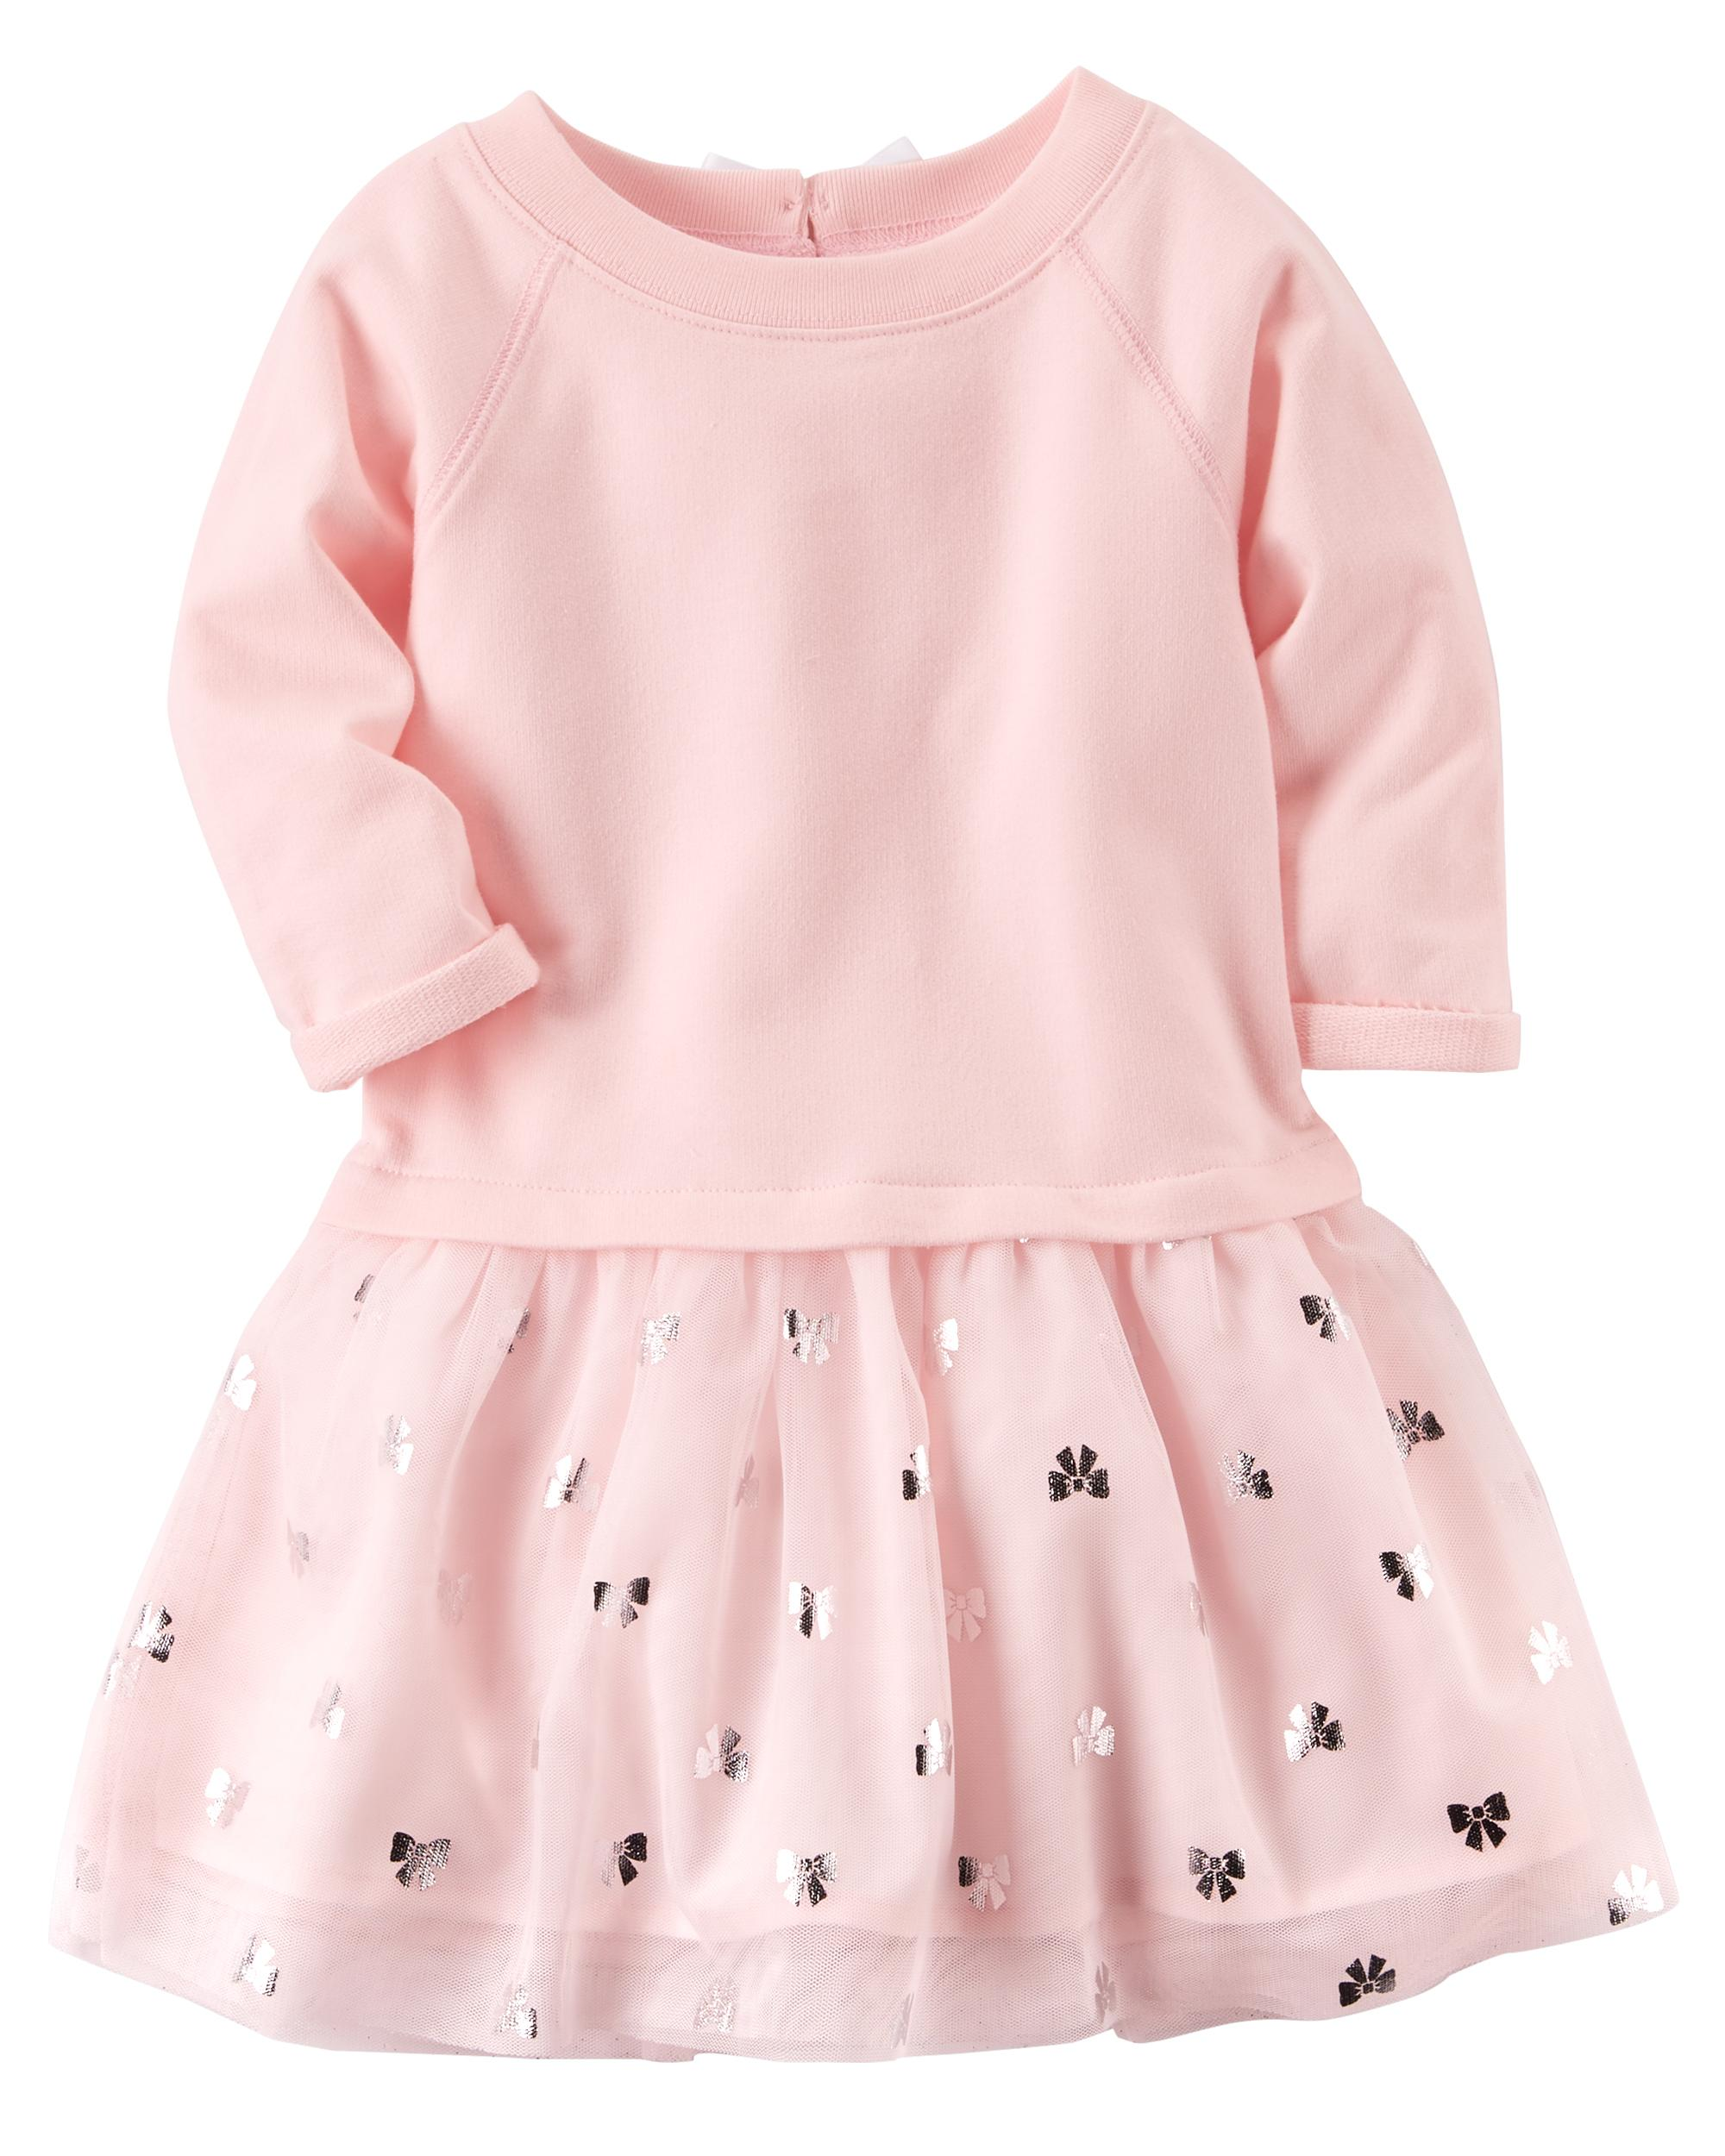 f266f0054a5a9 Bow Tutu Dress | carters.com